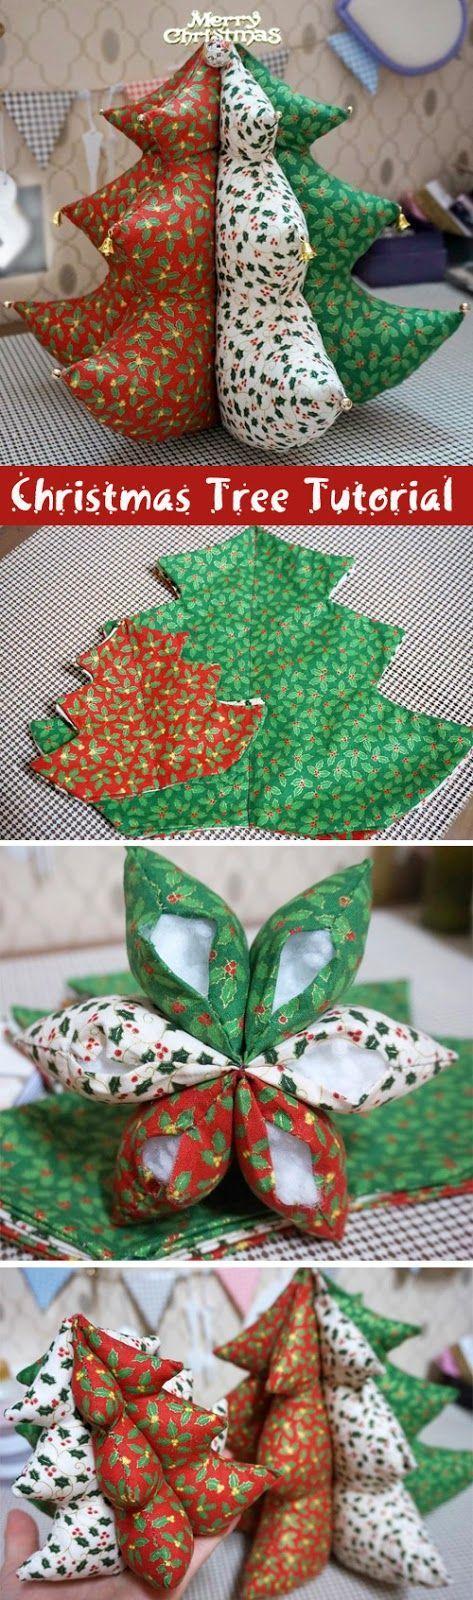 Рождественская елка. Мягкая игрушка своими руками. Christmas Tree. Soft Toy. DIY step-by-step tutorial. http://www.handmadiya.com/2015/09/christmas-tree-soft-toy-tutorial.html